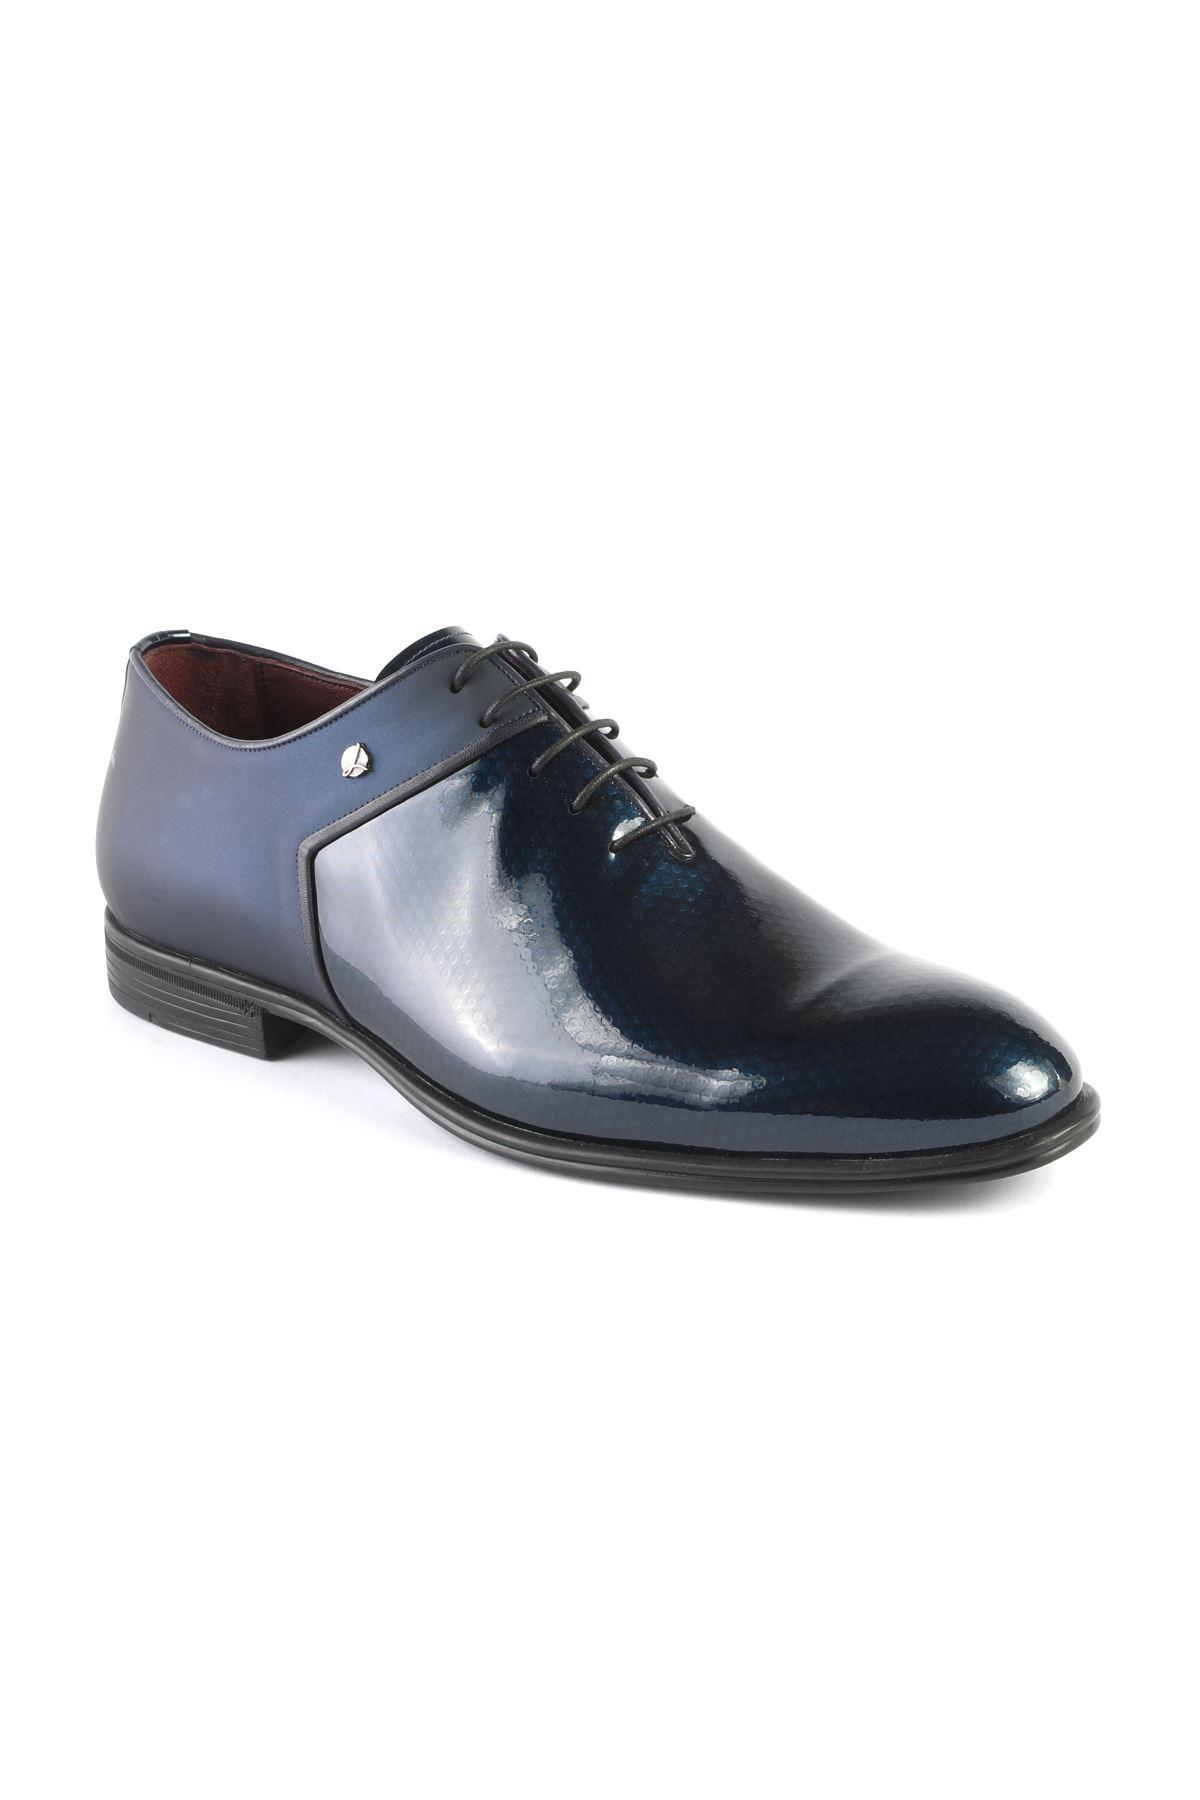 Libero T1244 Navy Blue Classic Shoes